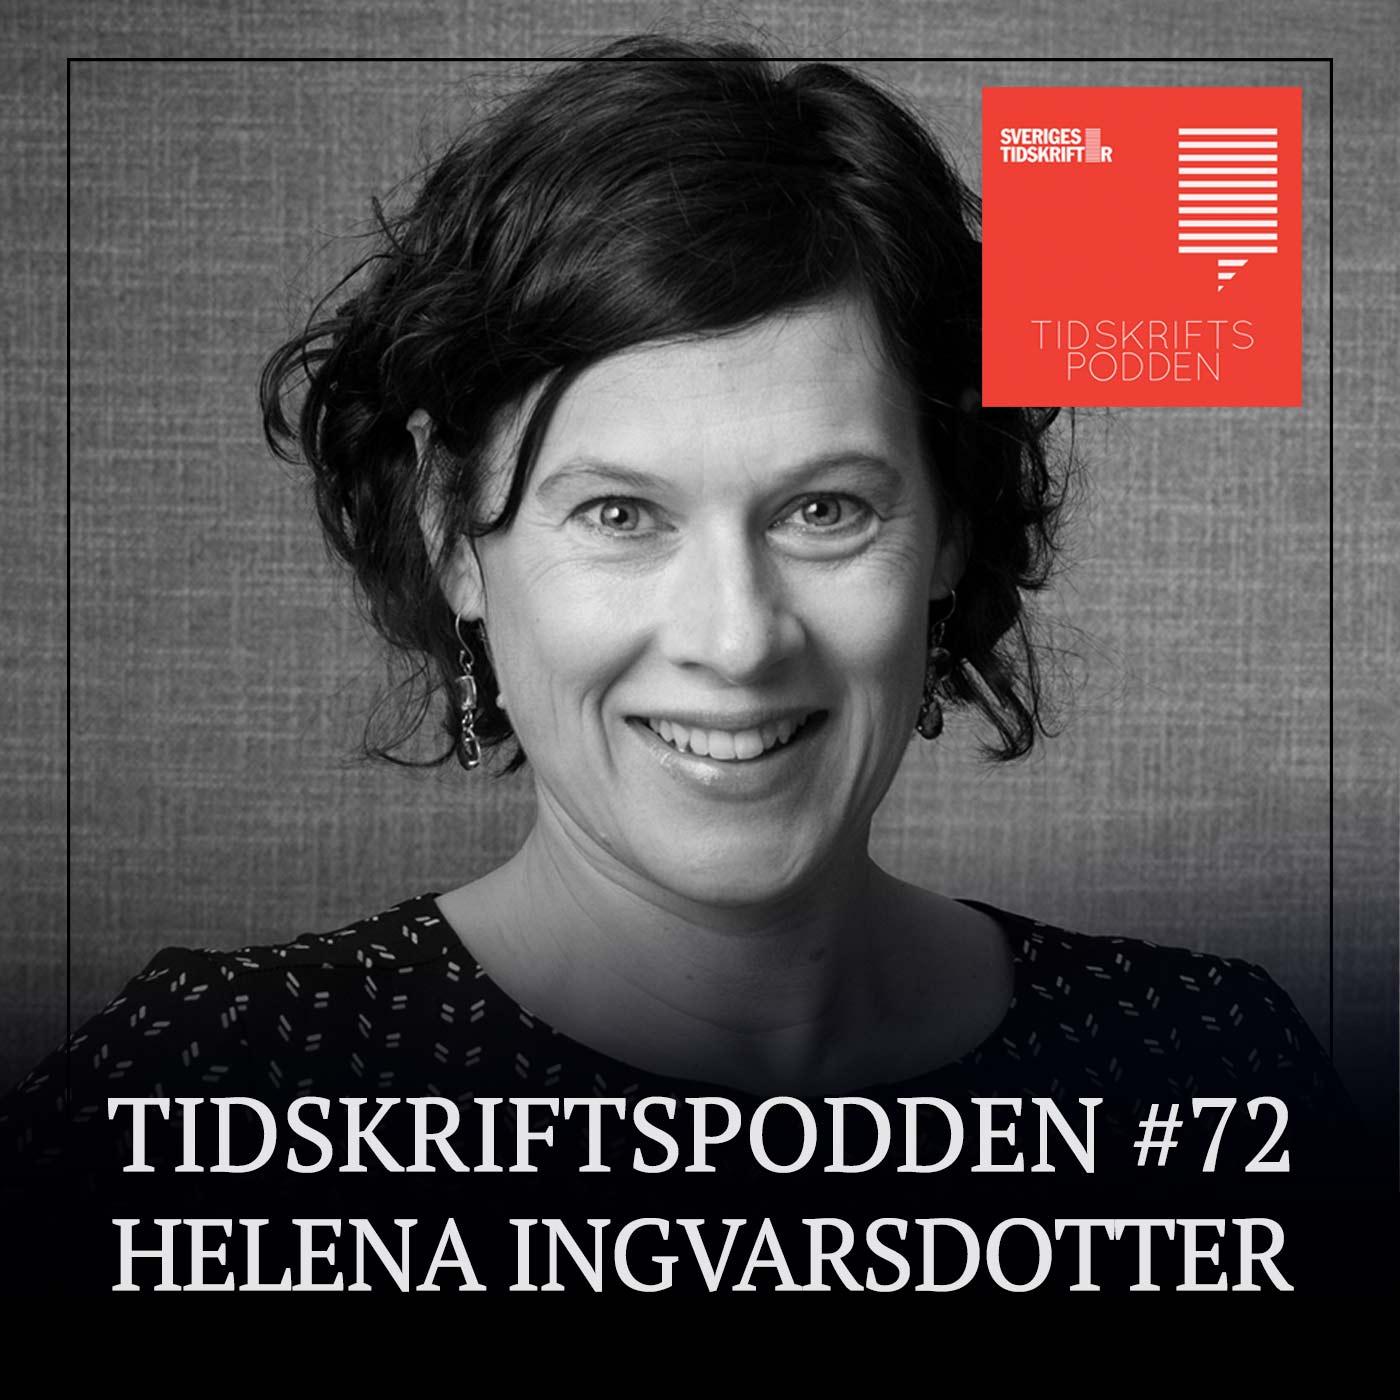 Helena Ingvarsdotter, Tidskriftspodden avsnitt 72